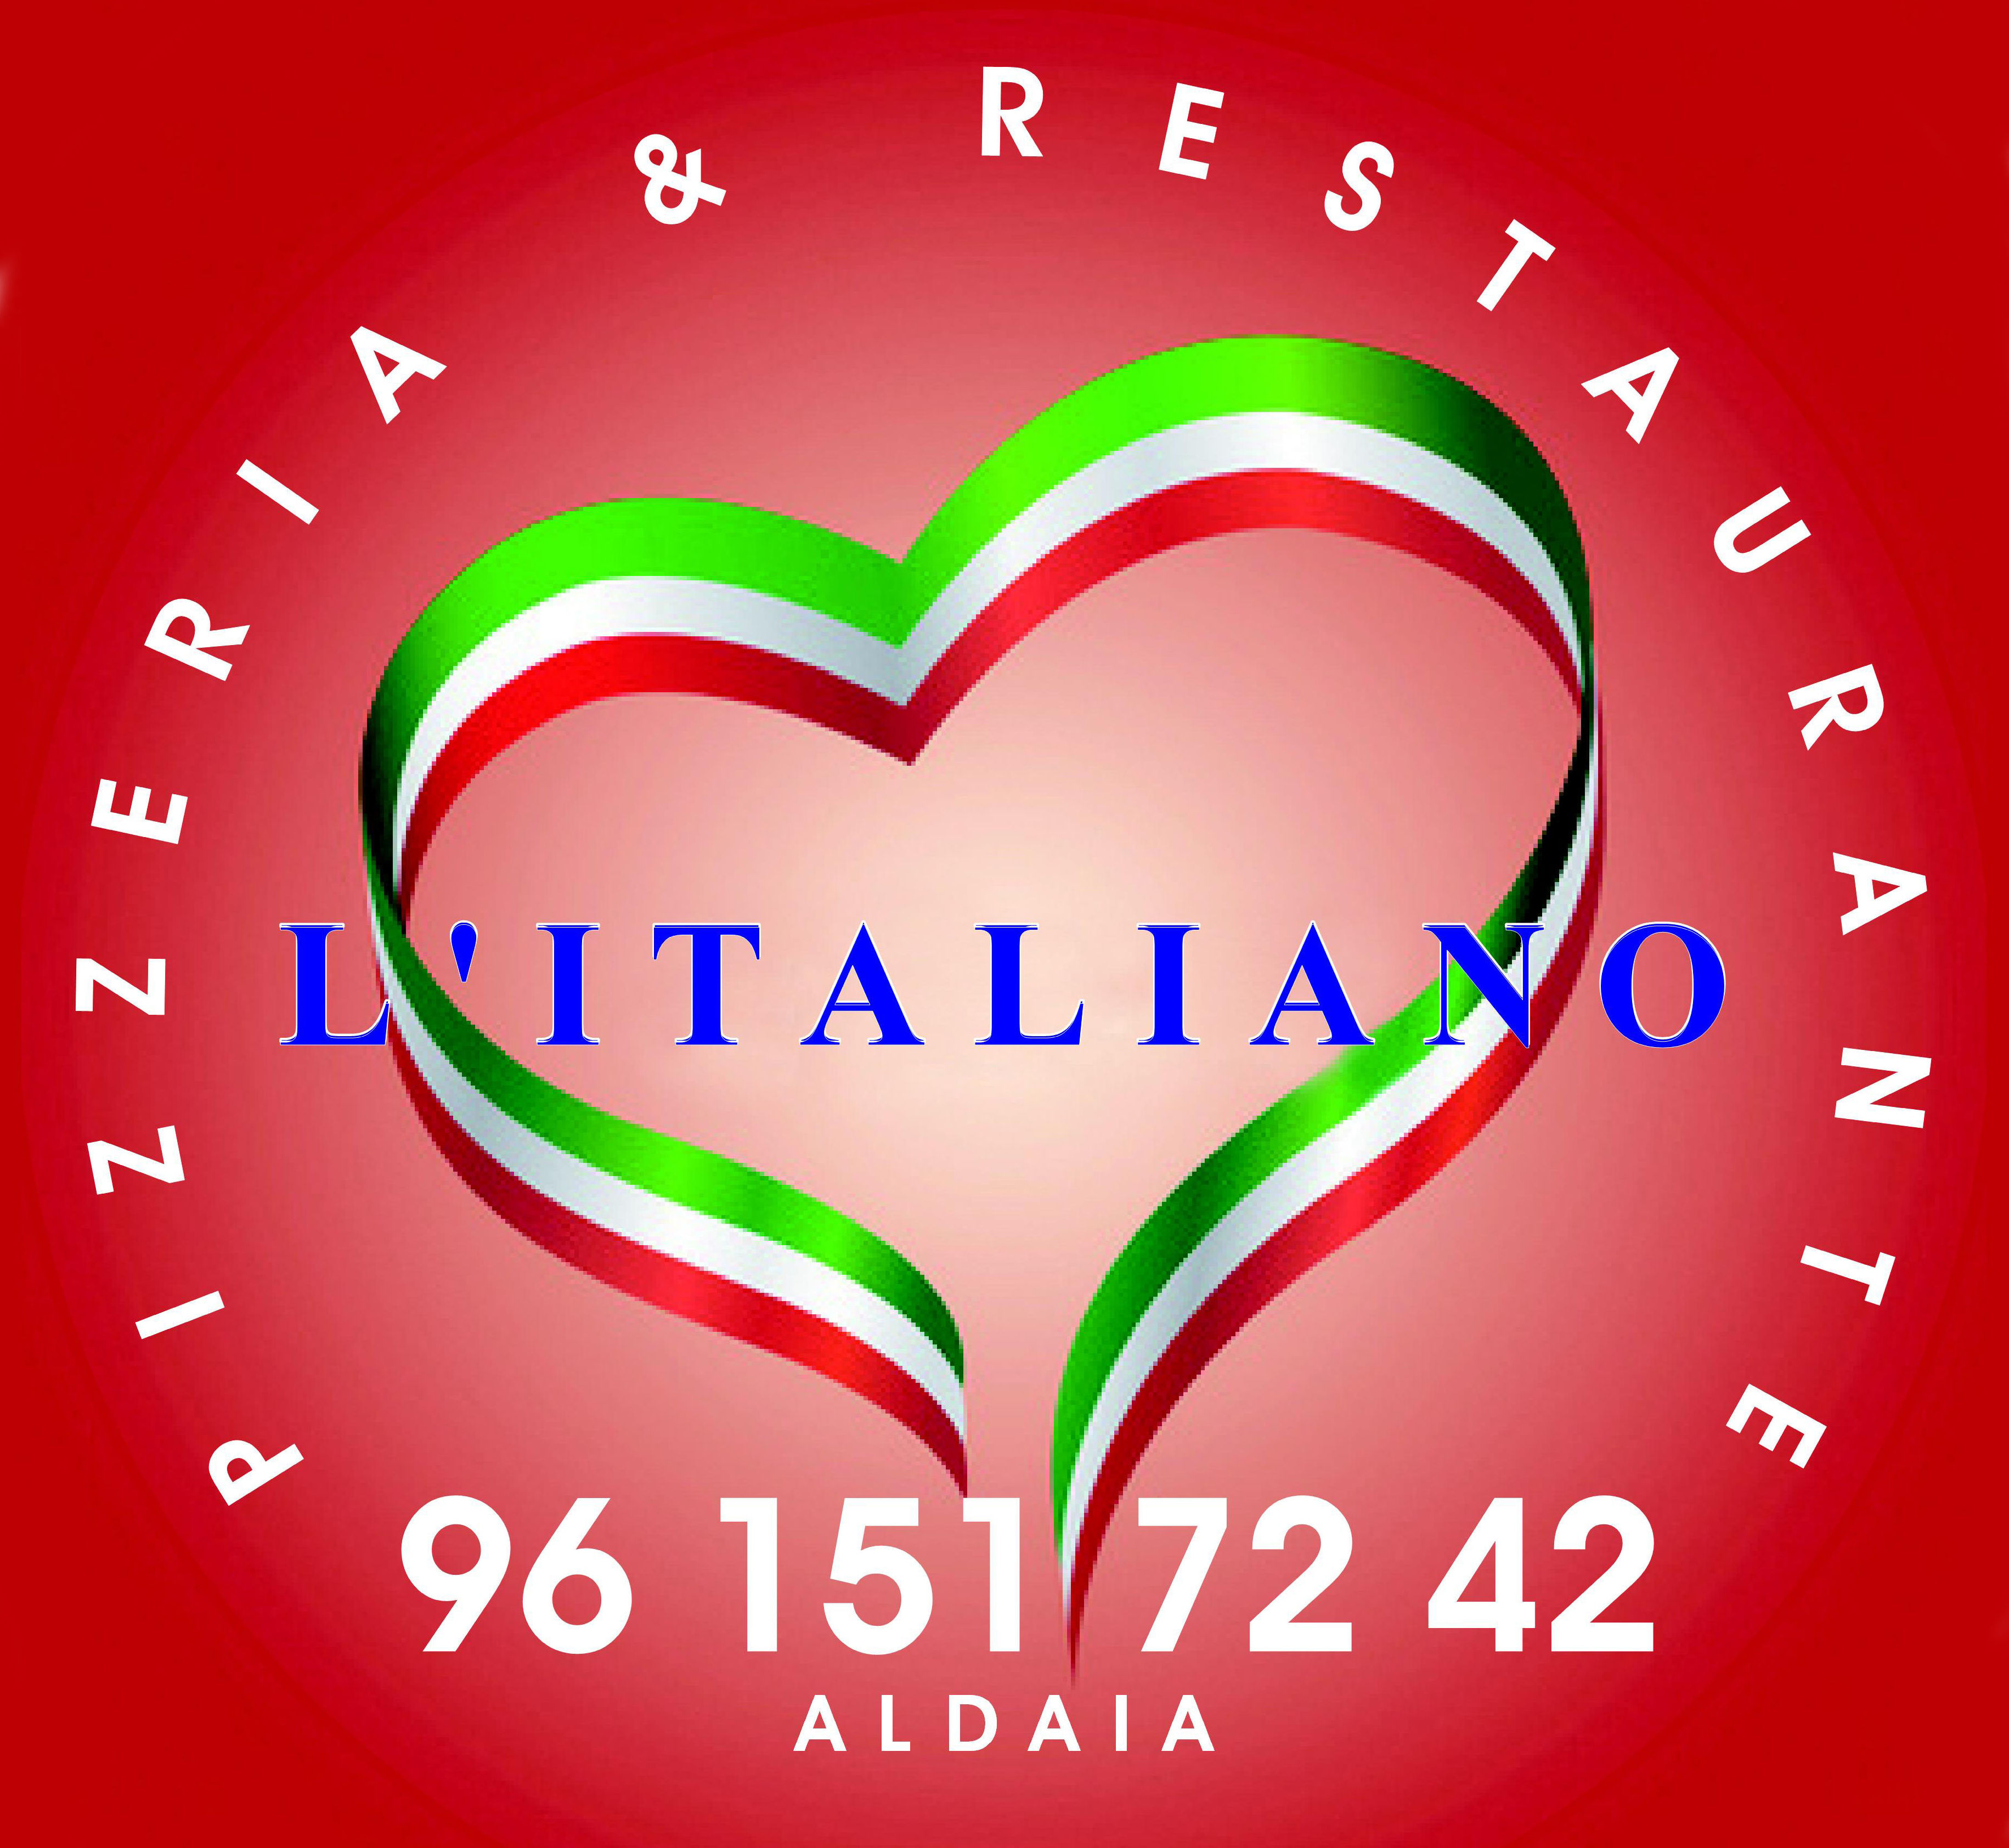 Foto 1 de Restaurante italiano en Aldaia | RESTAURANTE PIZZERIA L'ITALIANO